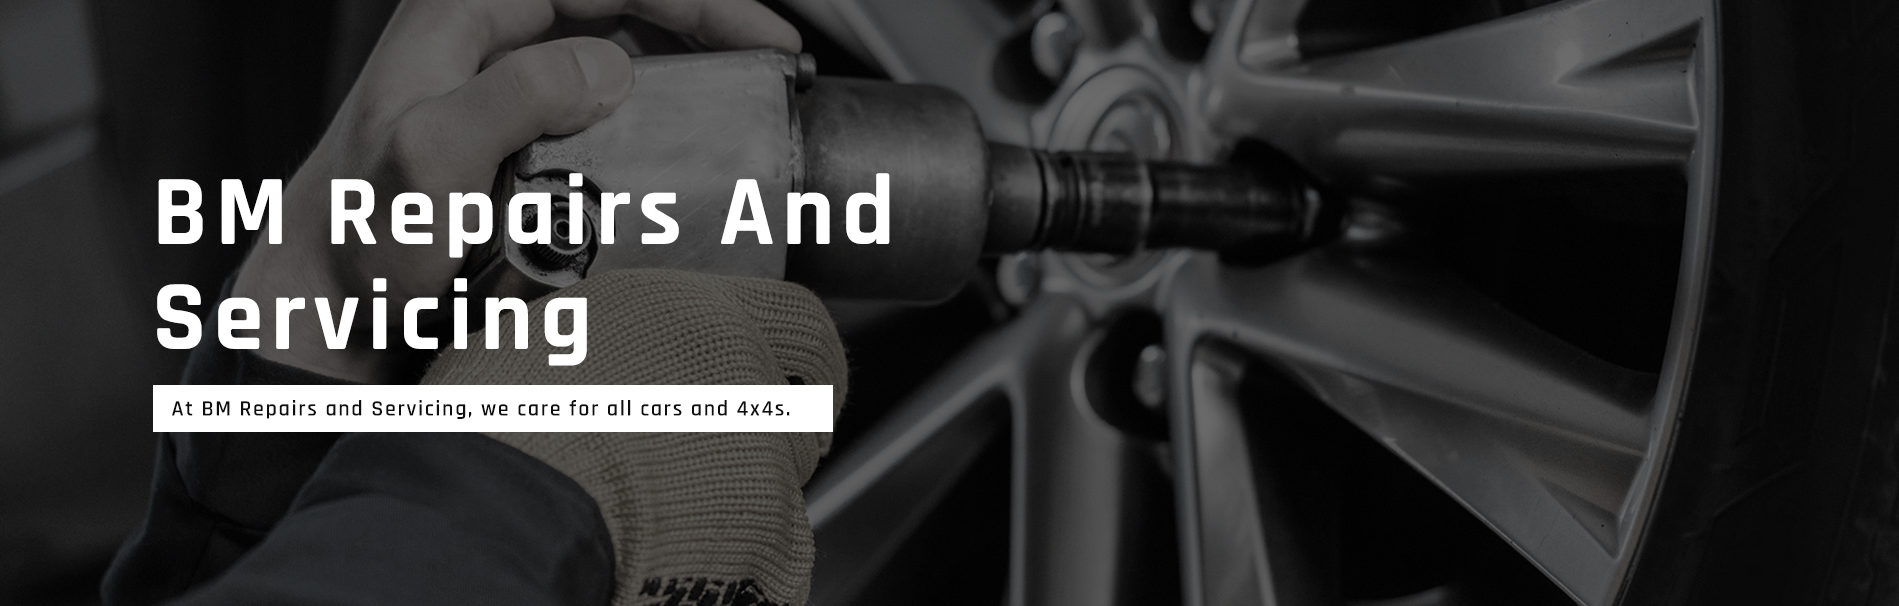 car-service-banner-image1